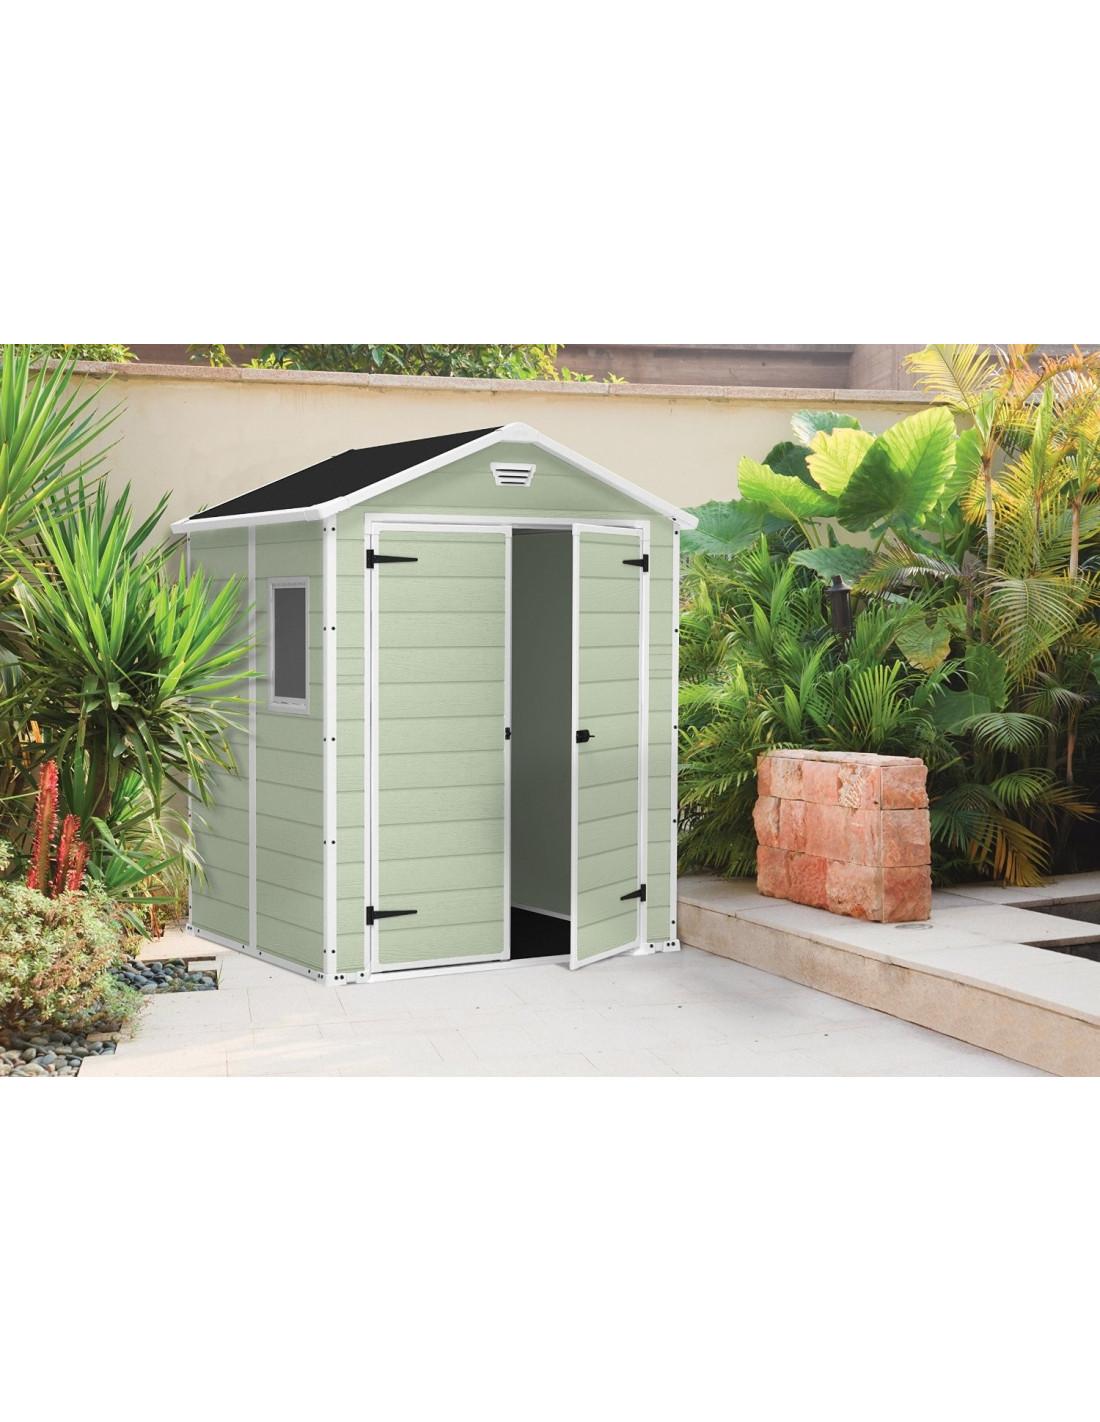 chalet jardin abri r sine premium 65 double porte 2 8m vert hyper brico. Black Bedroom Furniture Sets. Home Design Ideas